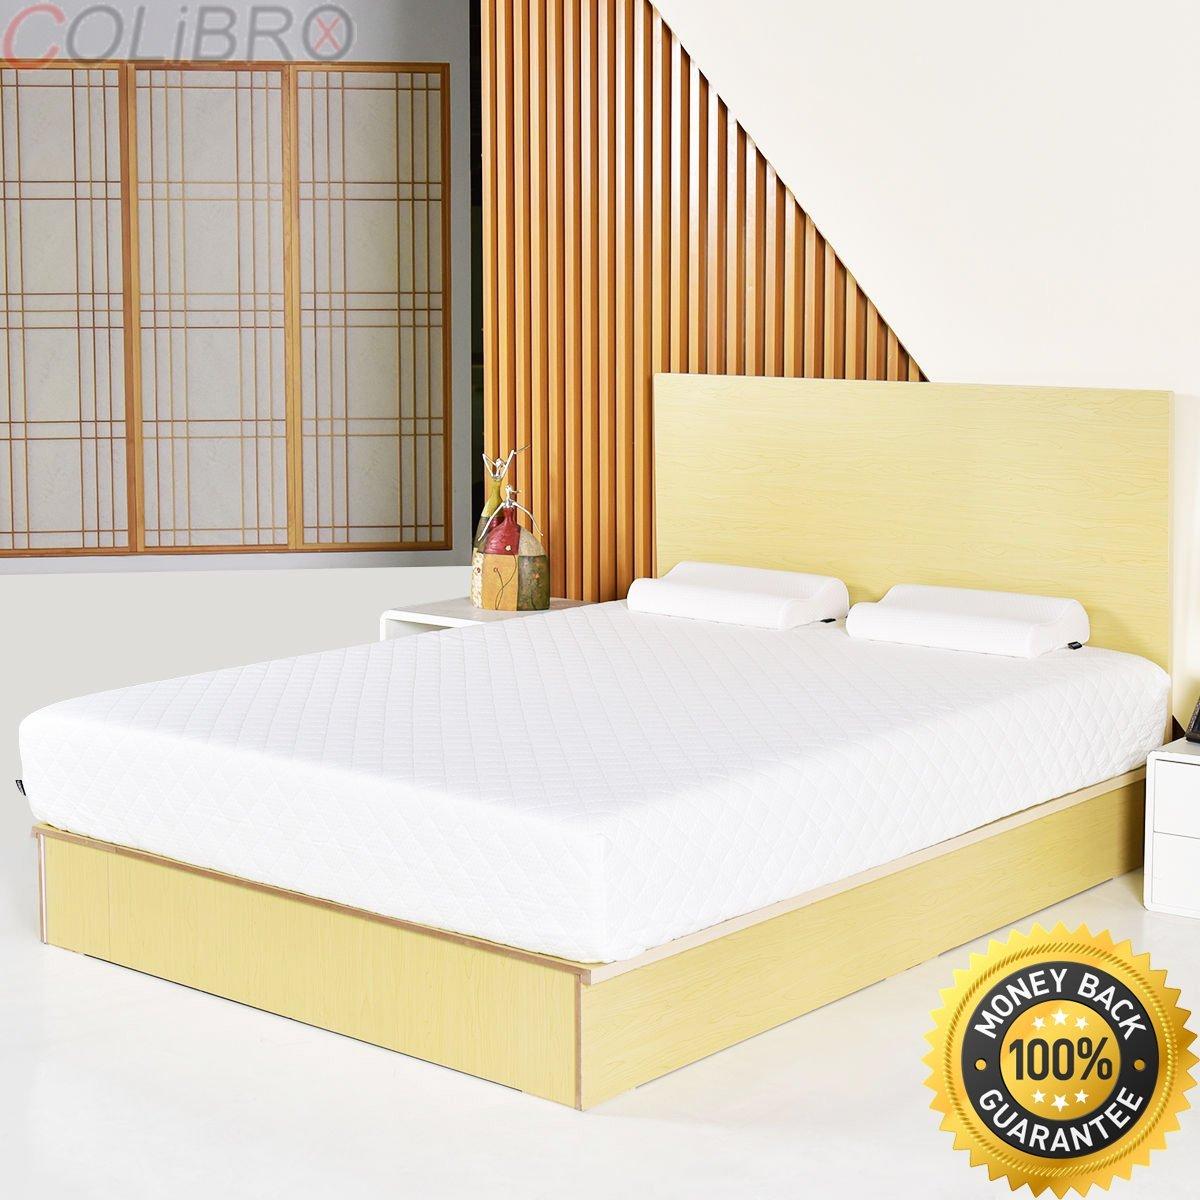 Colibrox Queen Size 12 Inch Memory Foam Mattress Sofa Bed W 2 Contoured